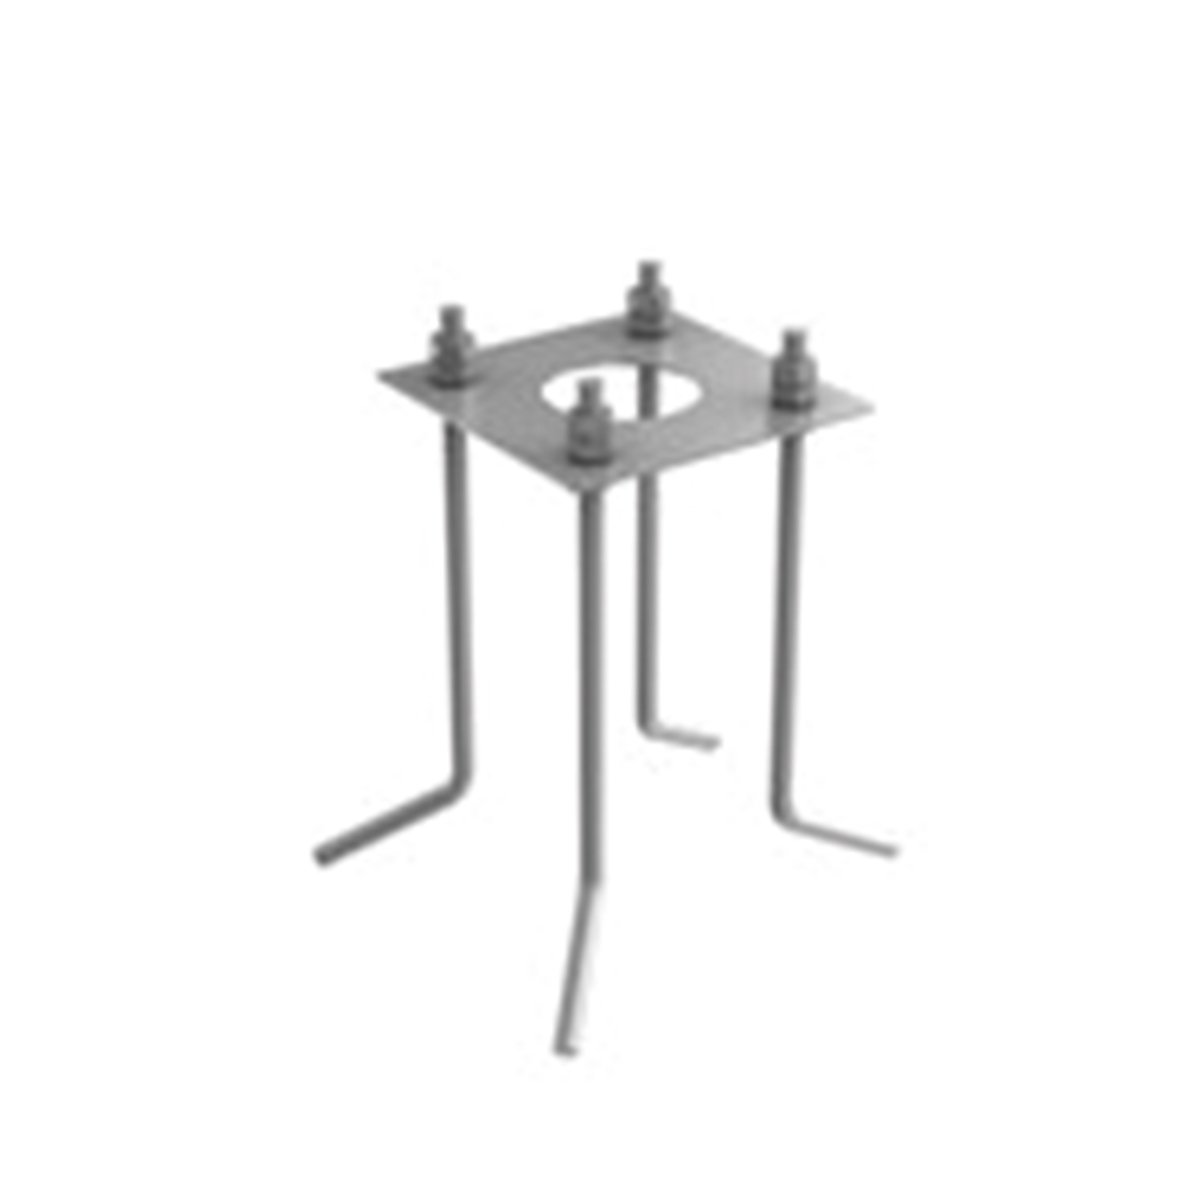 FLOS Base Plate Casting 100 Outdoor Vloerlamp